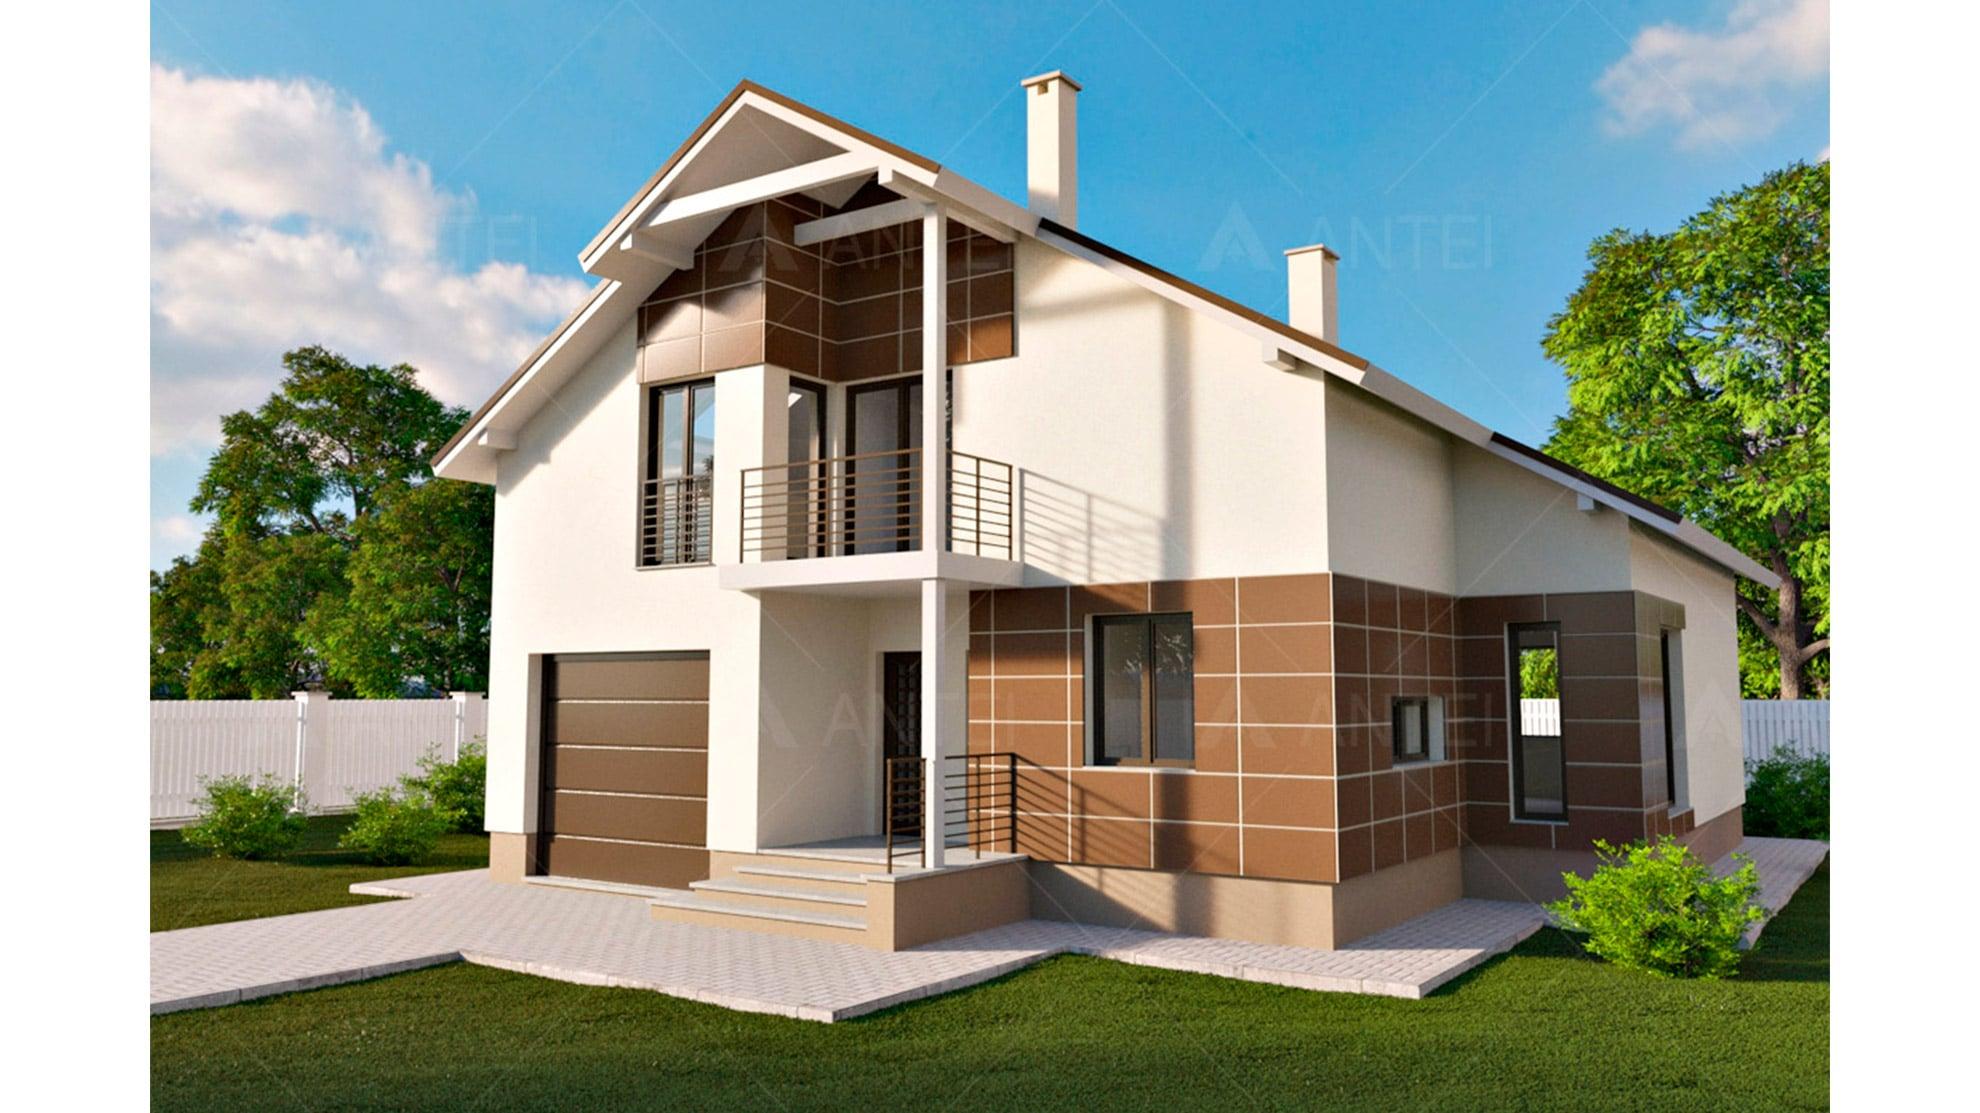 Проект мансардного дома с гаражом и балконом «КМ-59» - фото №1